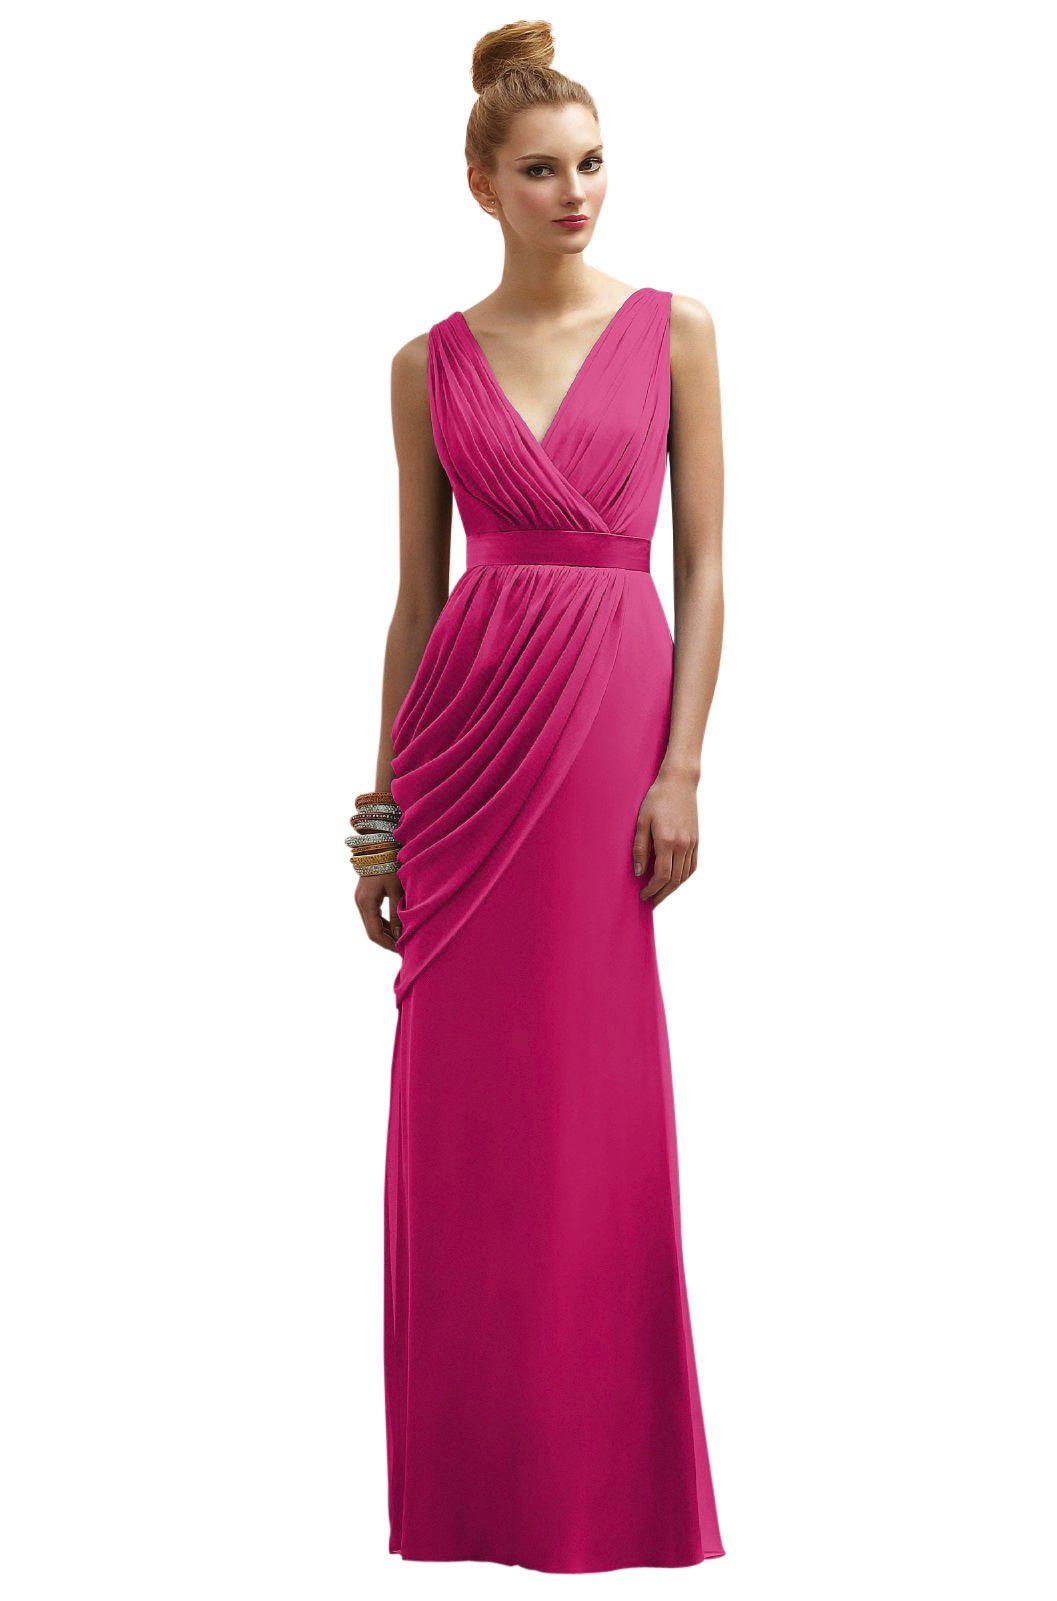 Lela Rose Lr174 Bridesmaid Dress | Weddington Way | My Wedding ...